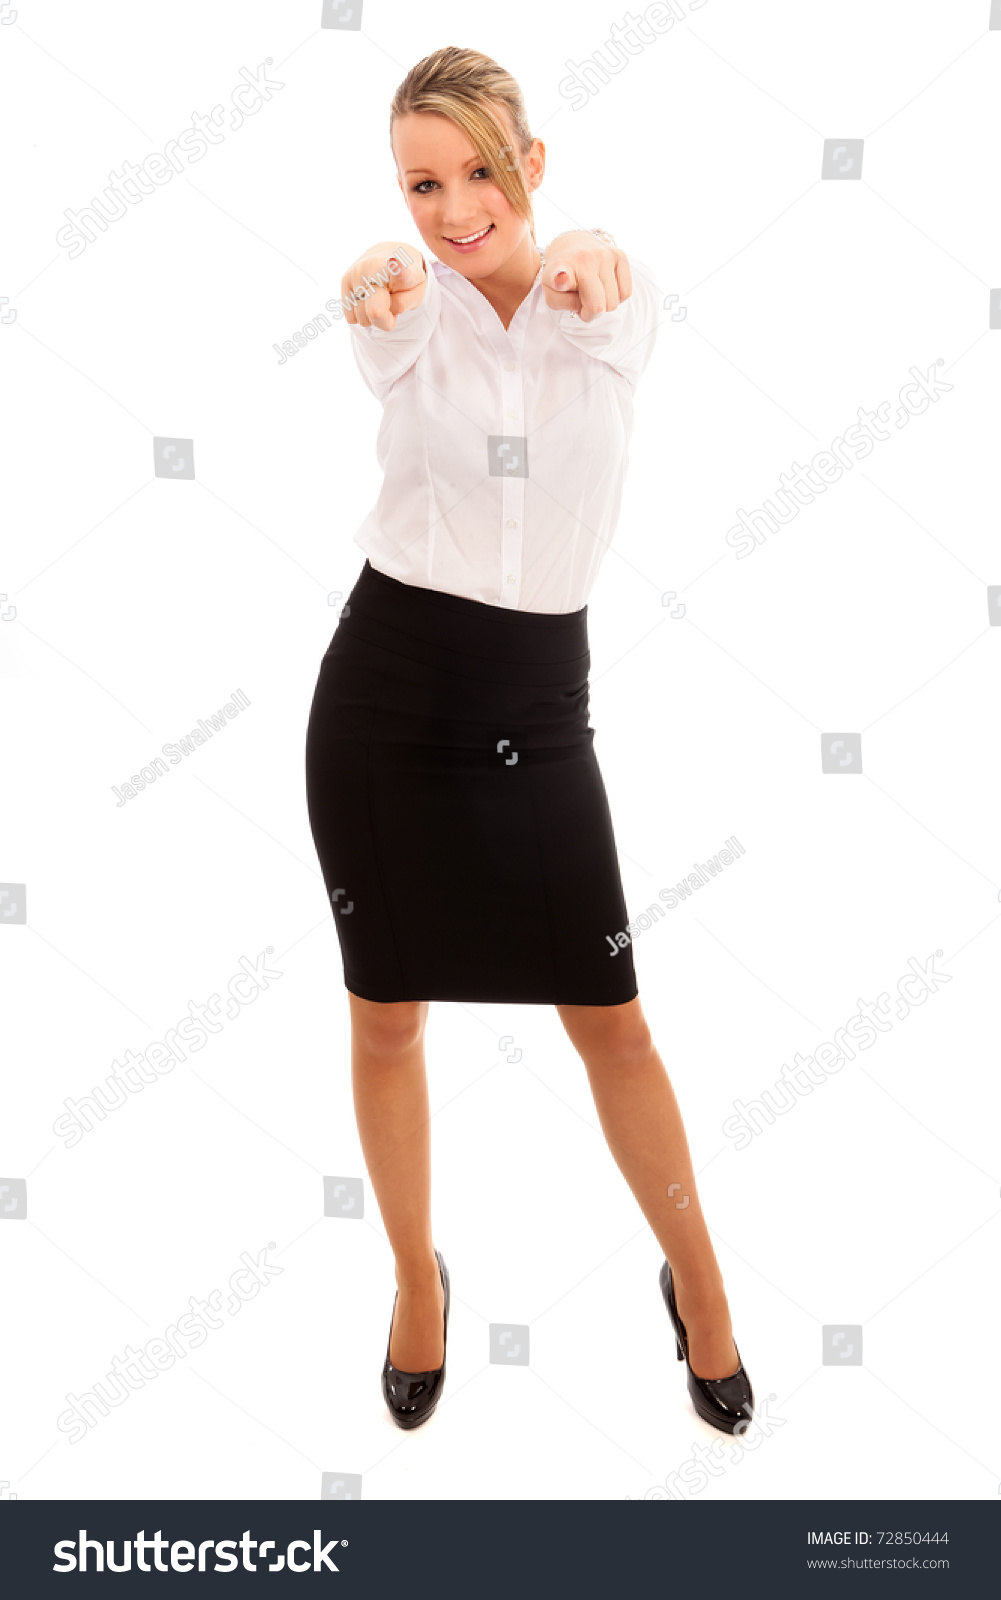 black single men in moorhead Meet single black women & men in moorhead, mn - 100% free: welcome to datehookupcom we're 100% free for everything, meet.